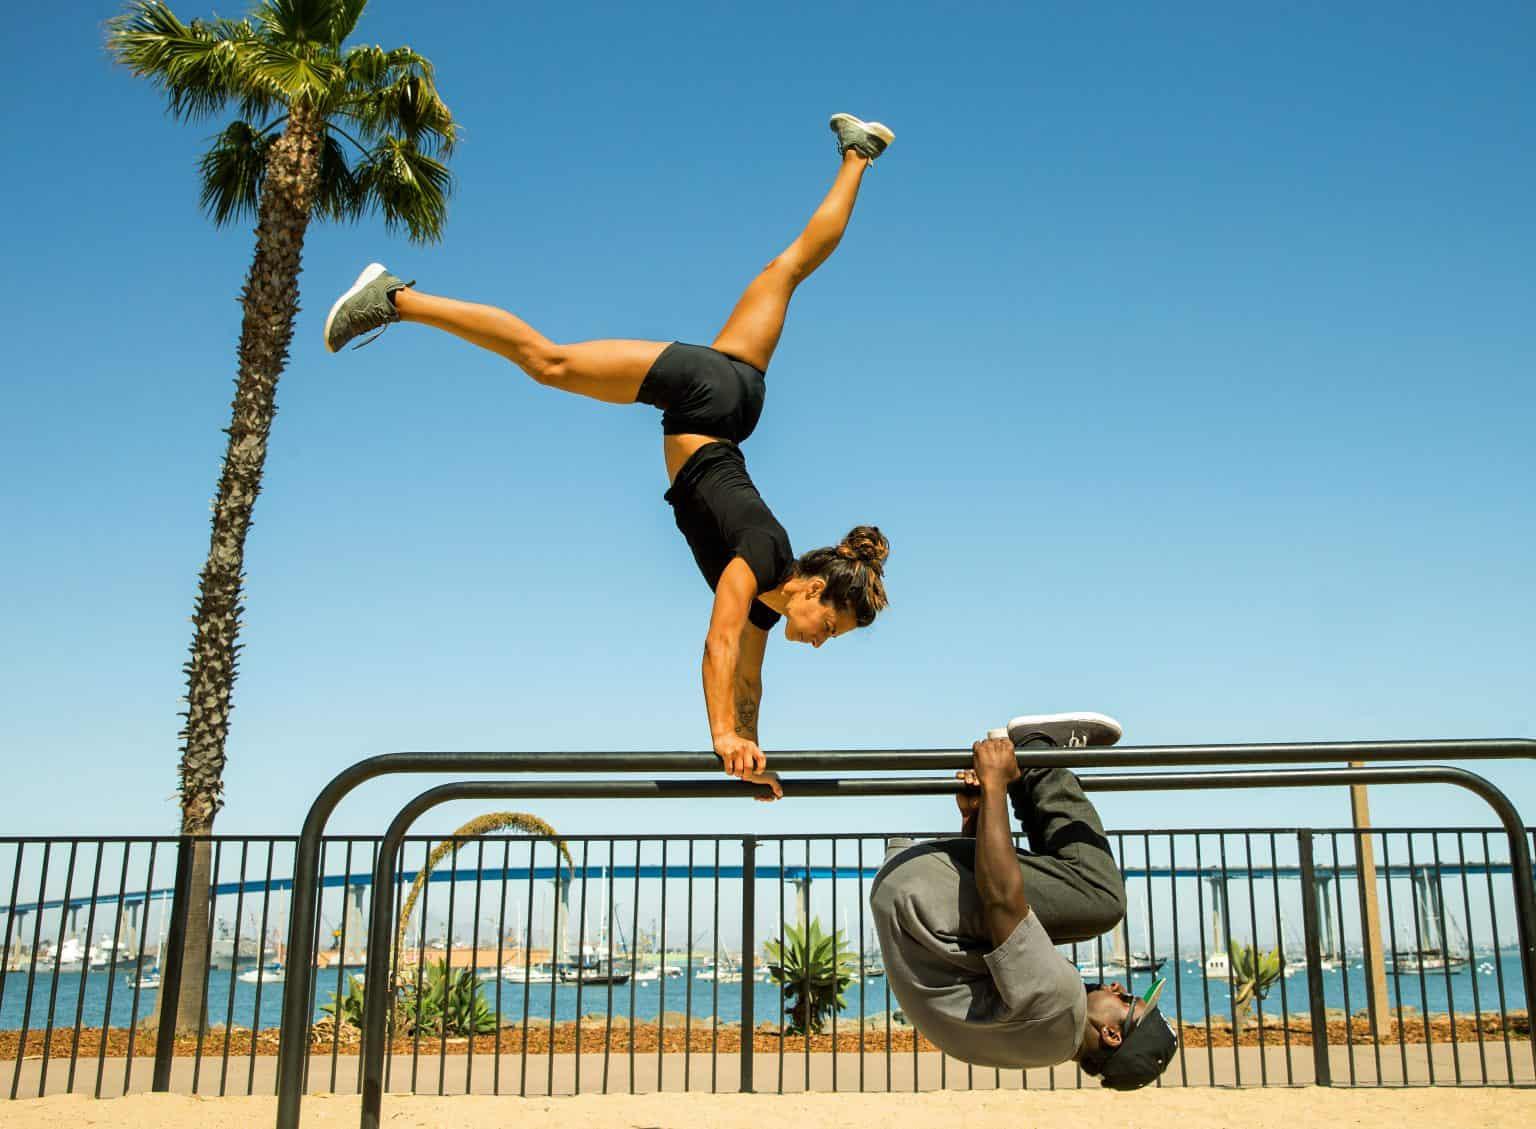 outdoor-fitness-equipment_49643791811_o-1536x1129